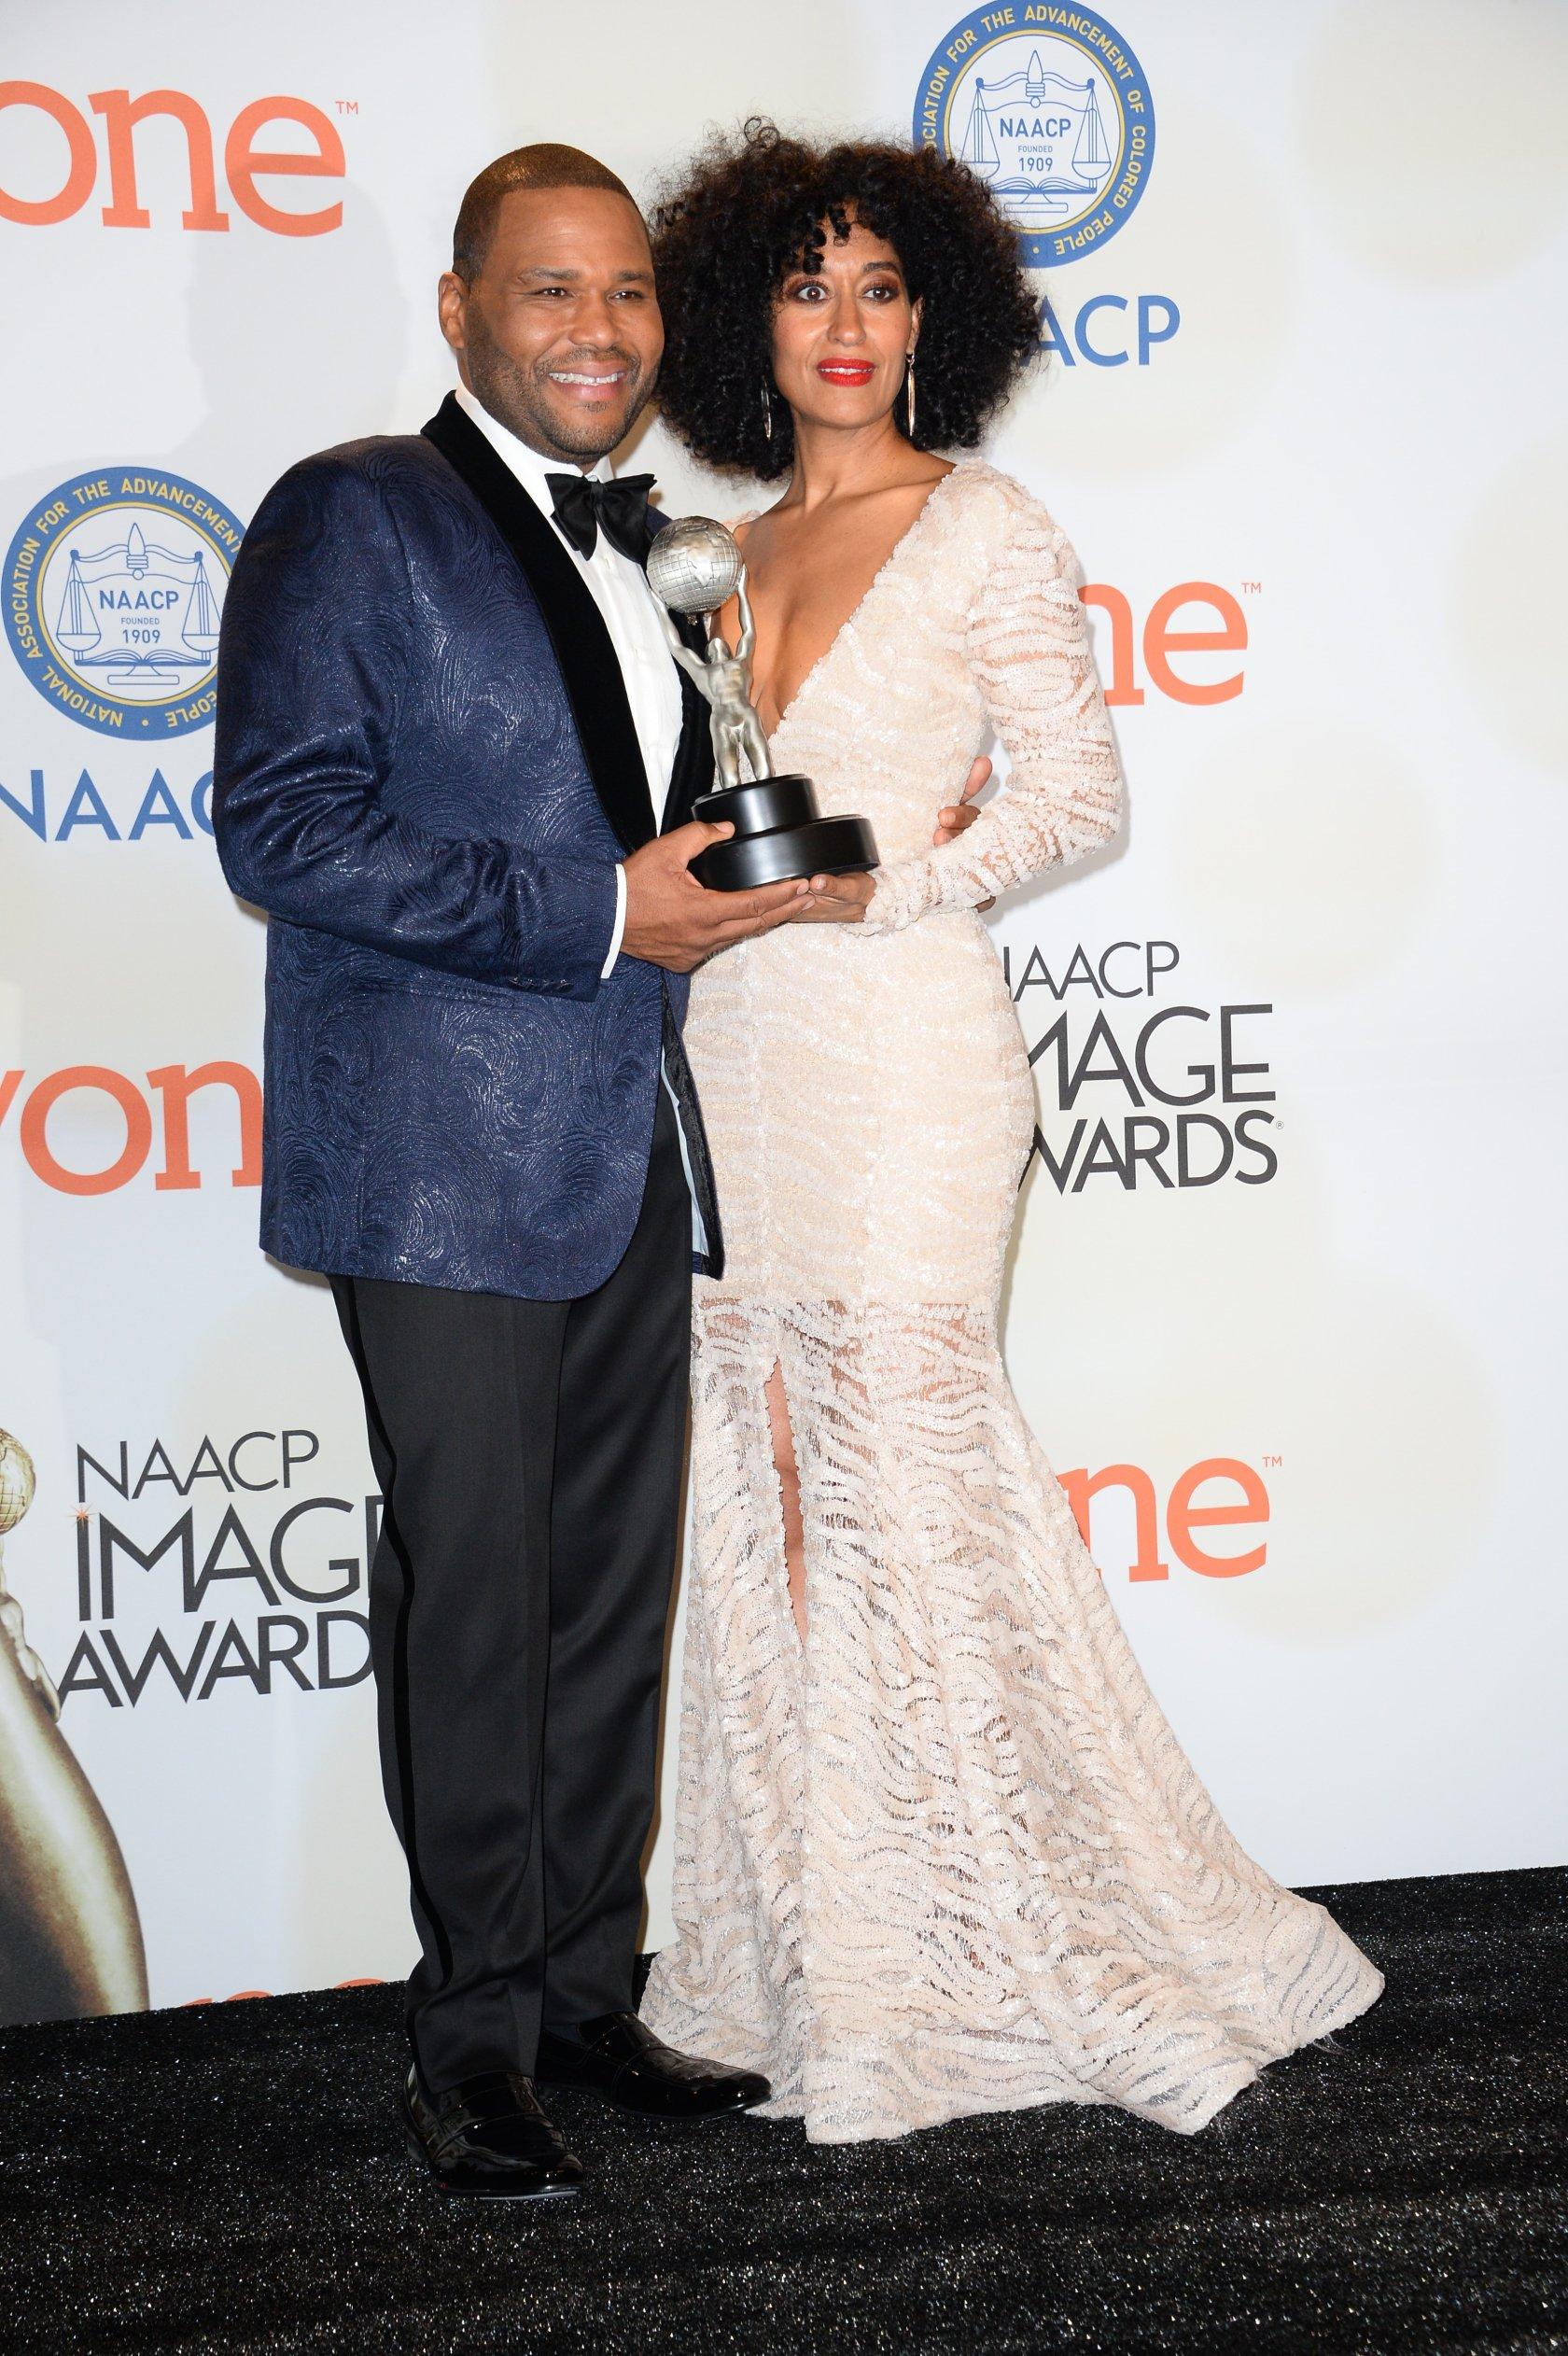 US-ENTERTAINMENT-NAACP IMAGE AWARDS-PRESS ROOM